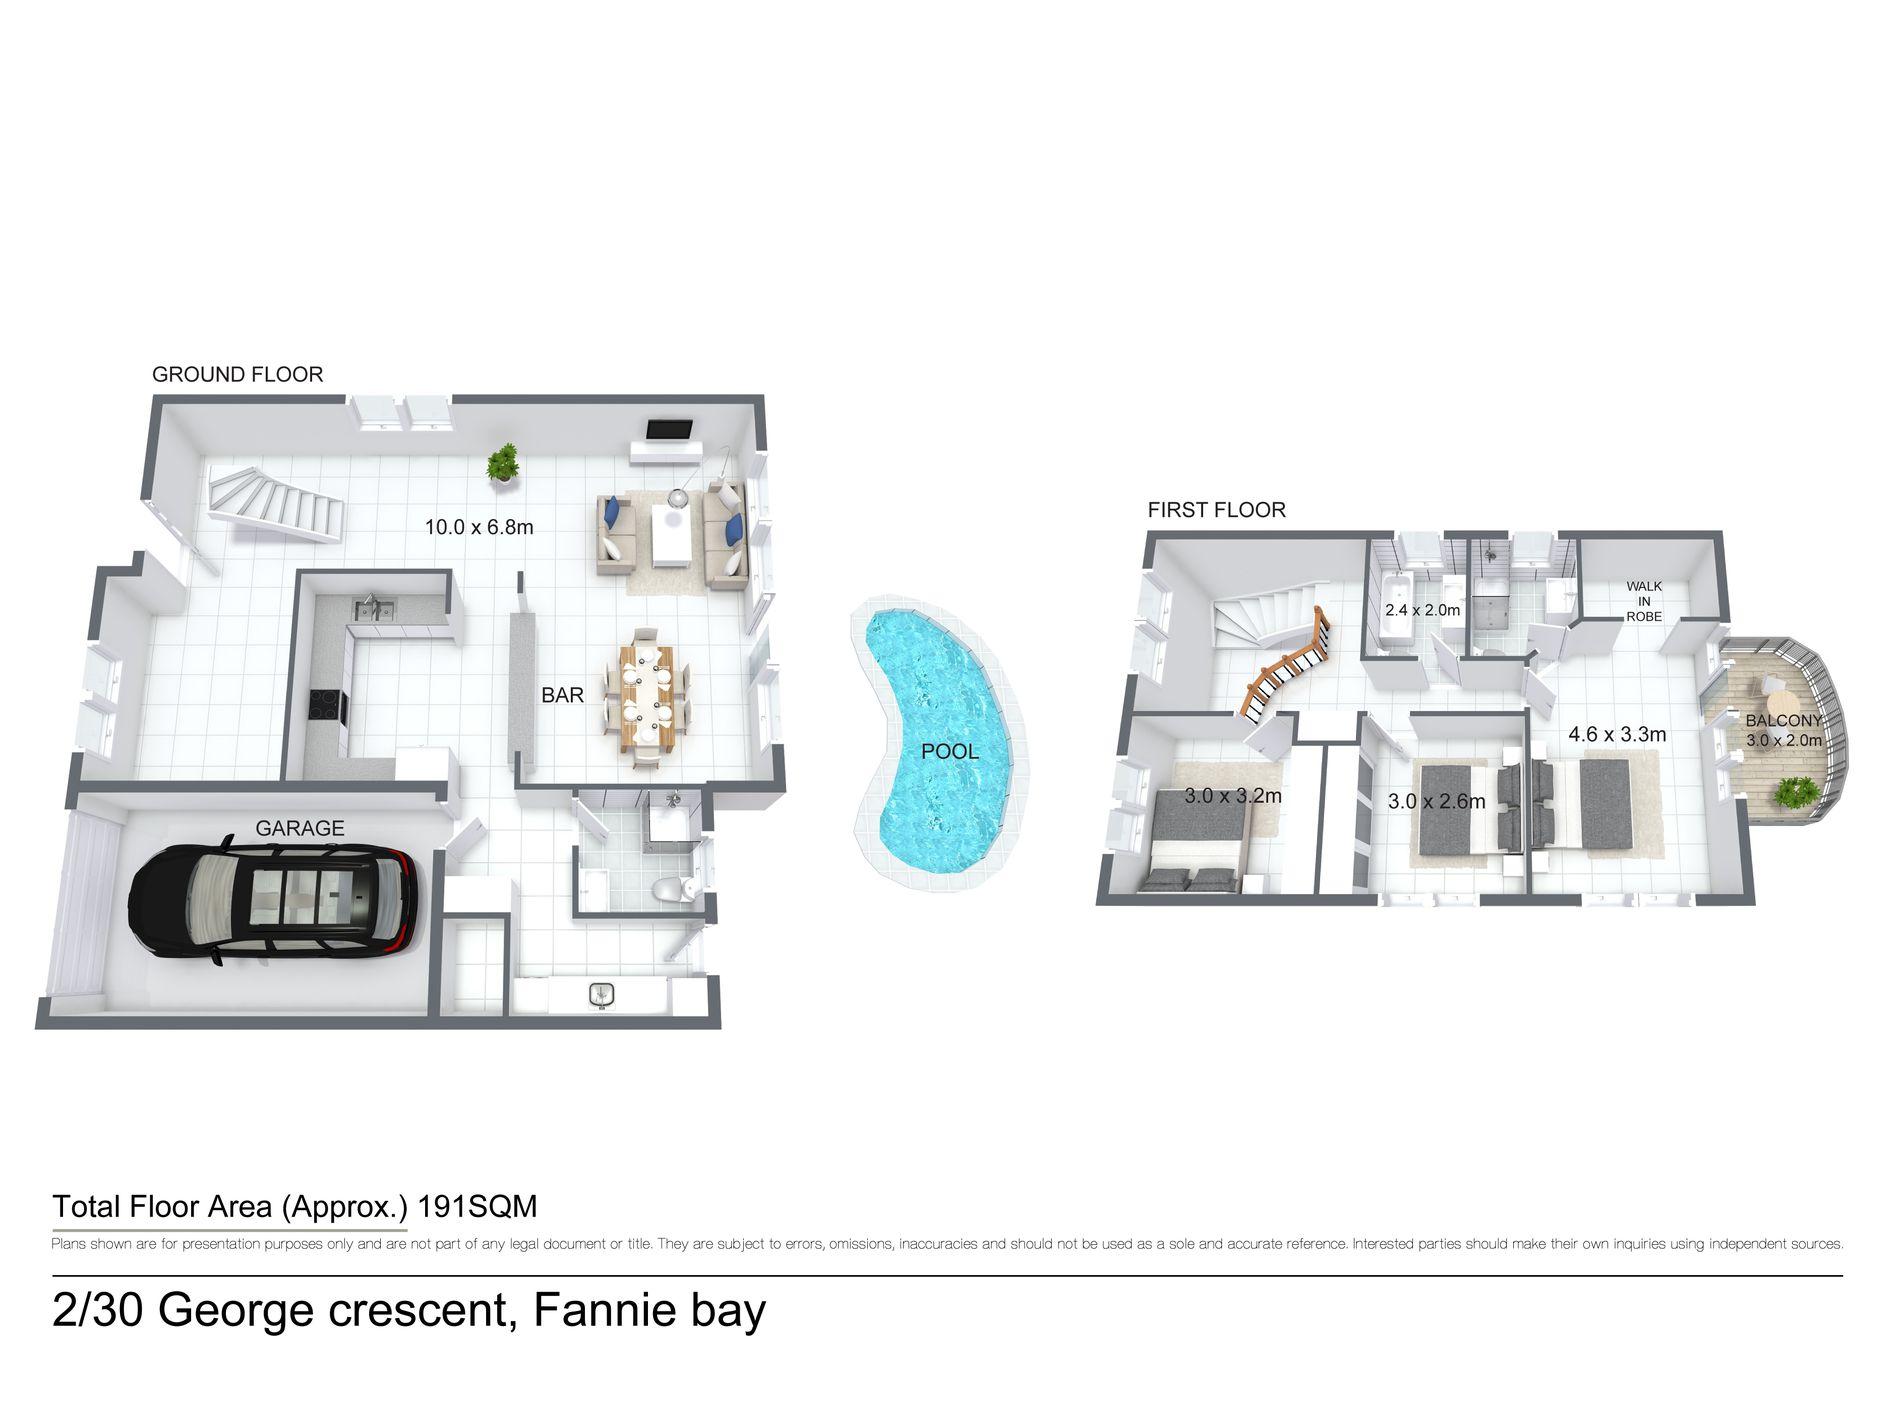 2 / 30 George Crescent, Fannie Bay